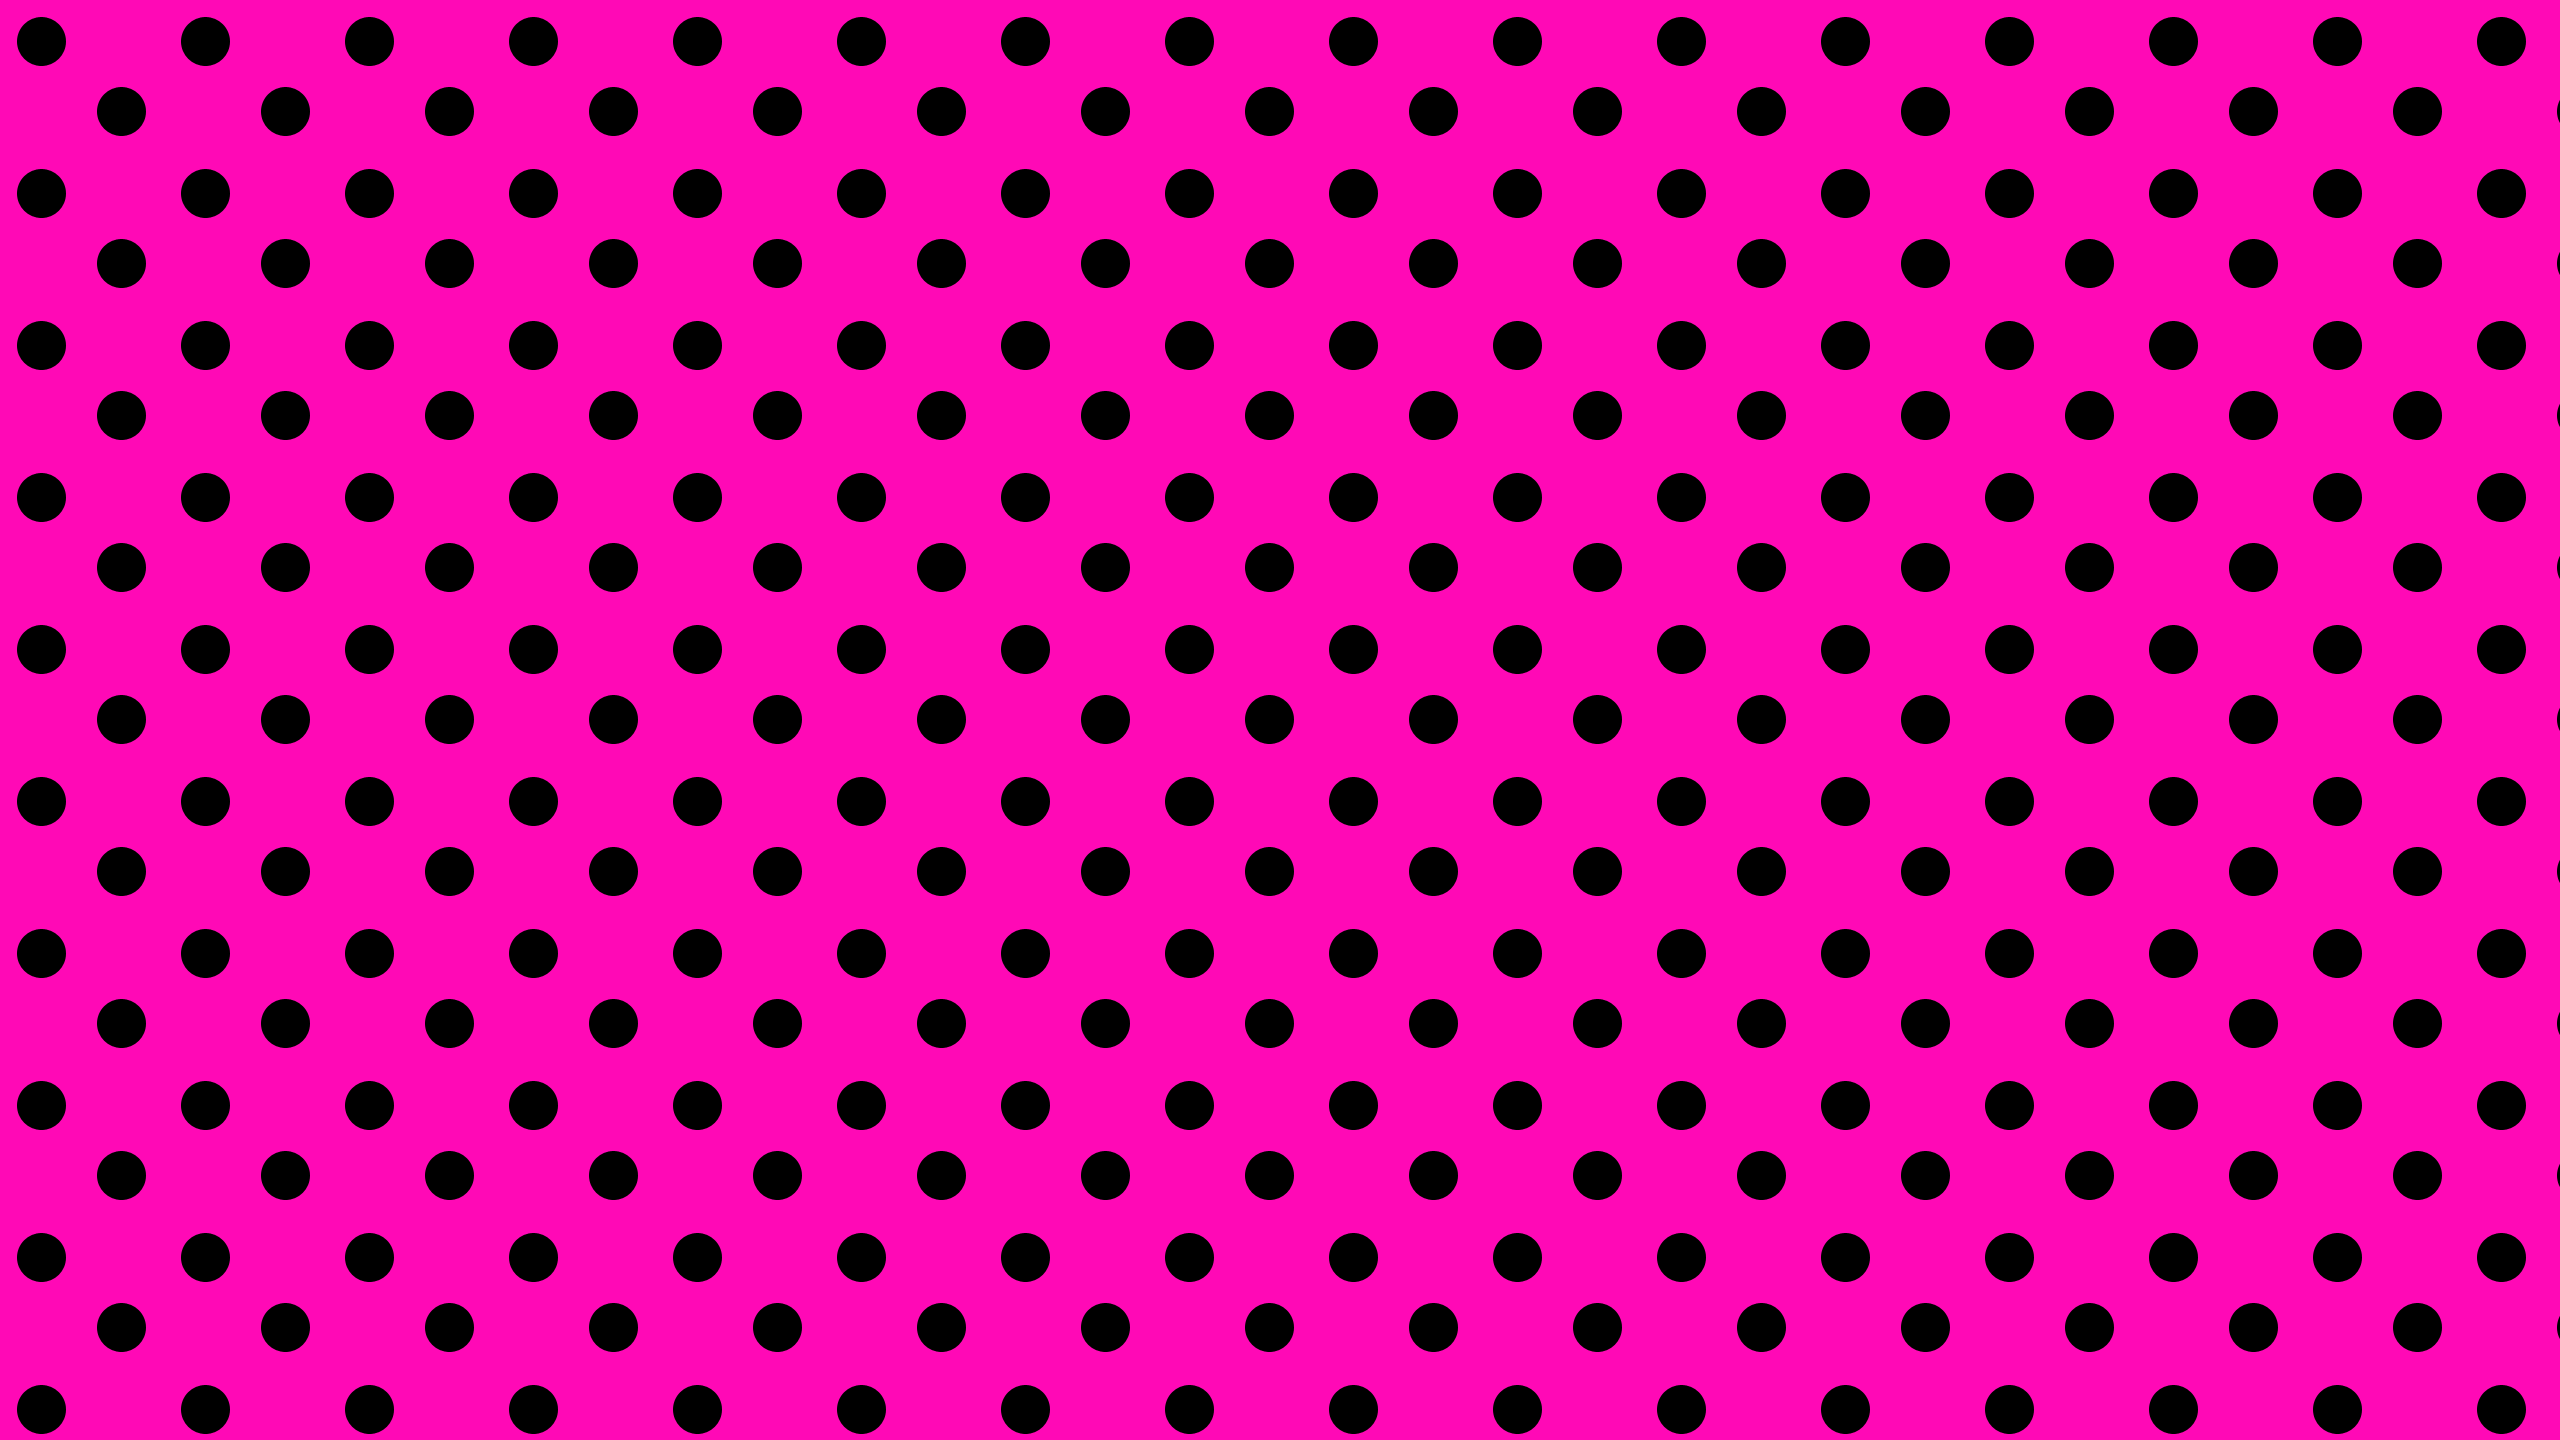 Large Pink Black Desktop Wallpaper is easy Just save the wallpaper 2560x1440